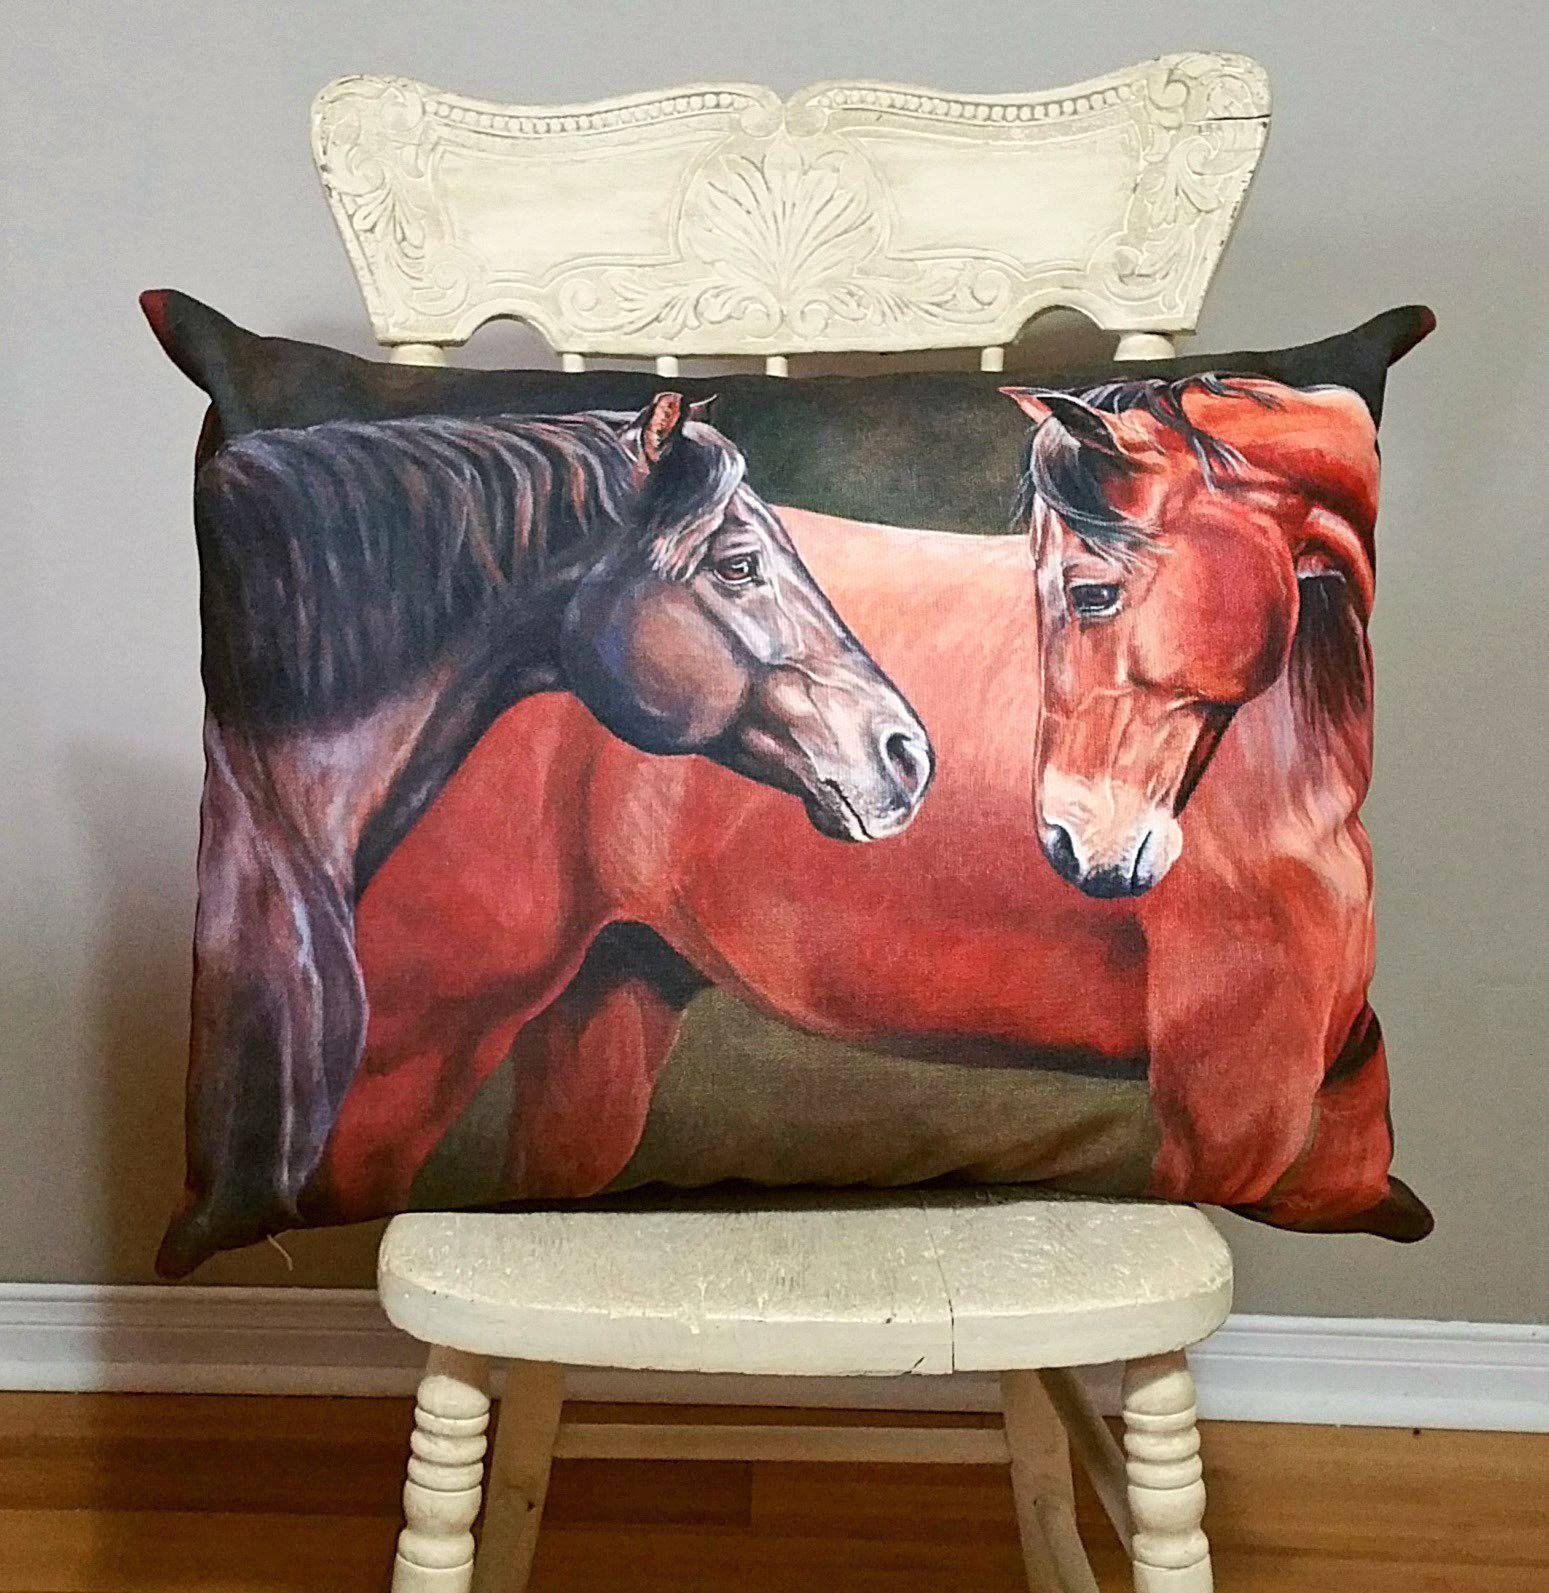 Forever Friends Equine Art Decor Pillow Cover 20x14, Horse Decor, Equestrian Home Decor, Horse Lovers, Horse Woman decor pillow, Western - #cover #decor #equine #forever #friends #horse #pillow - #EquineArt